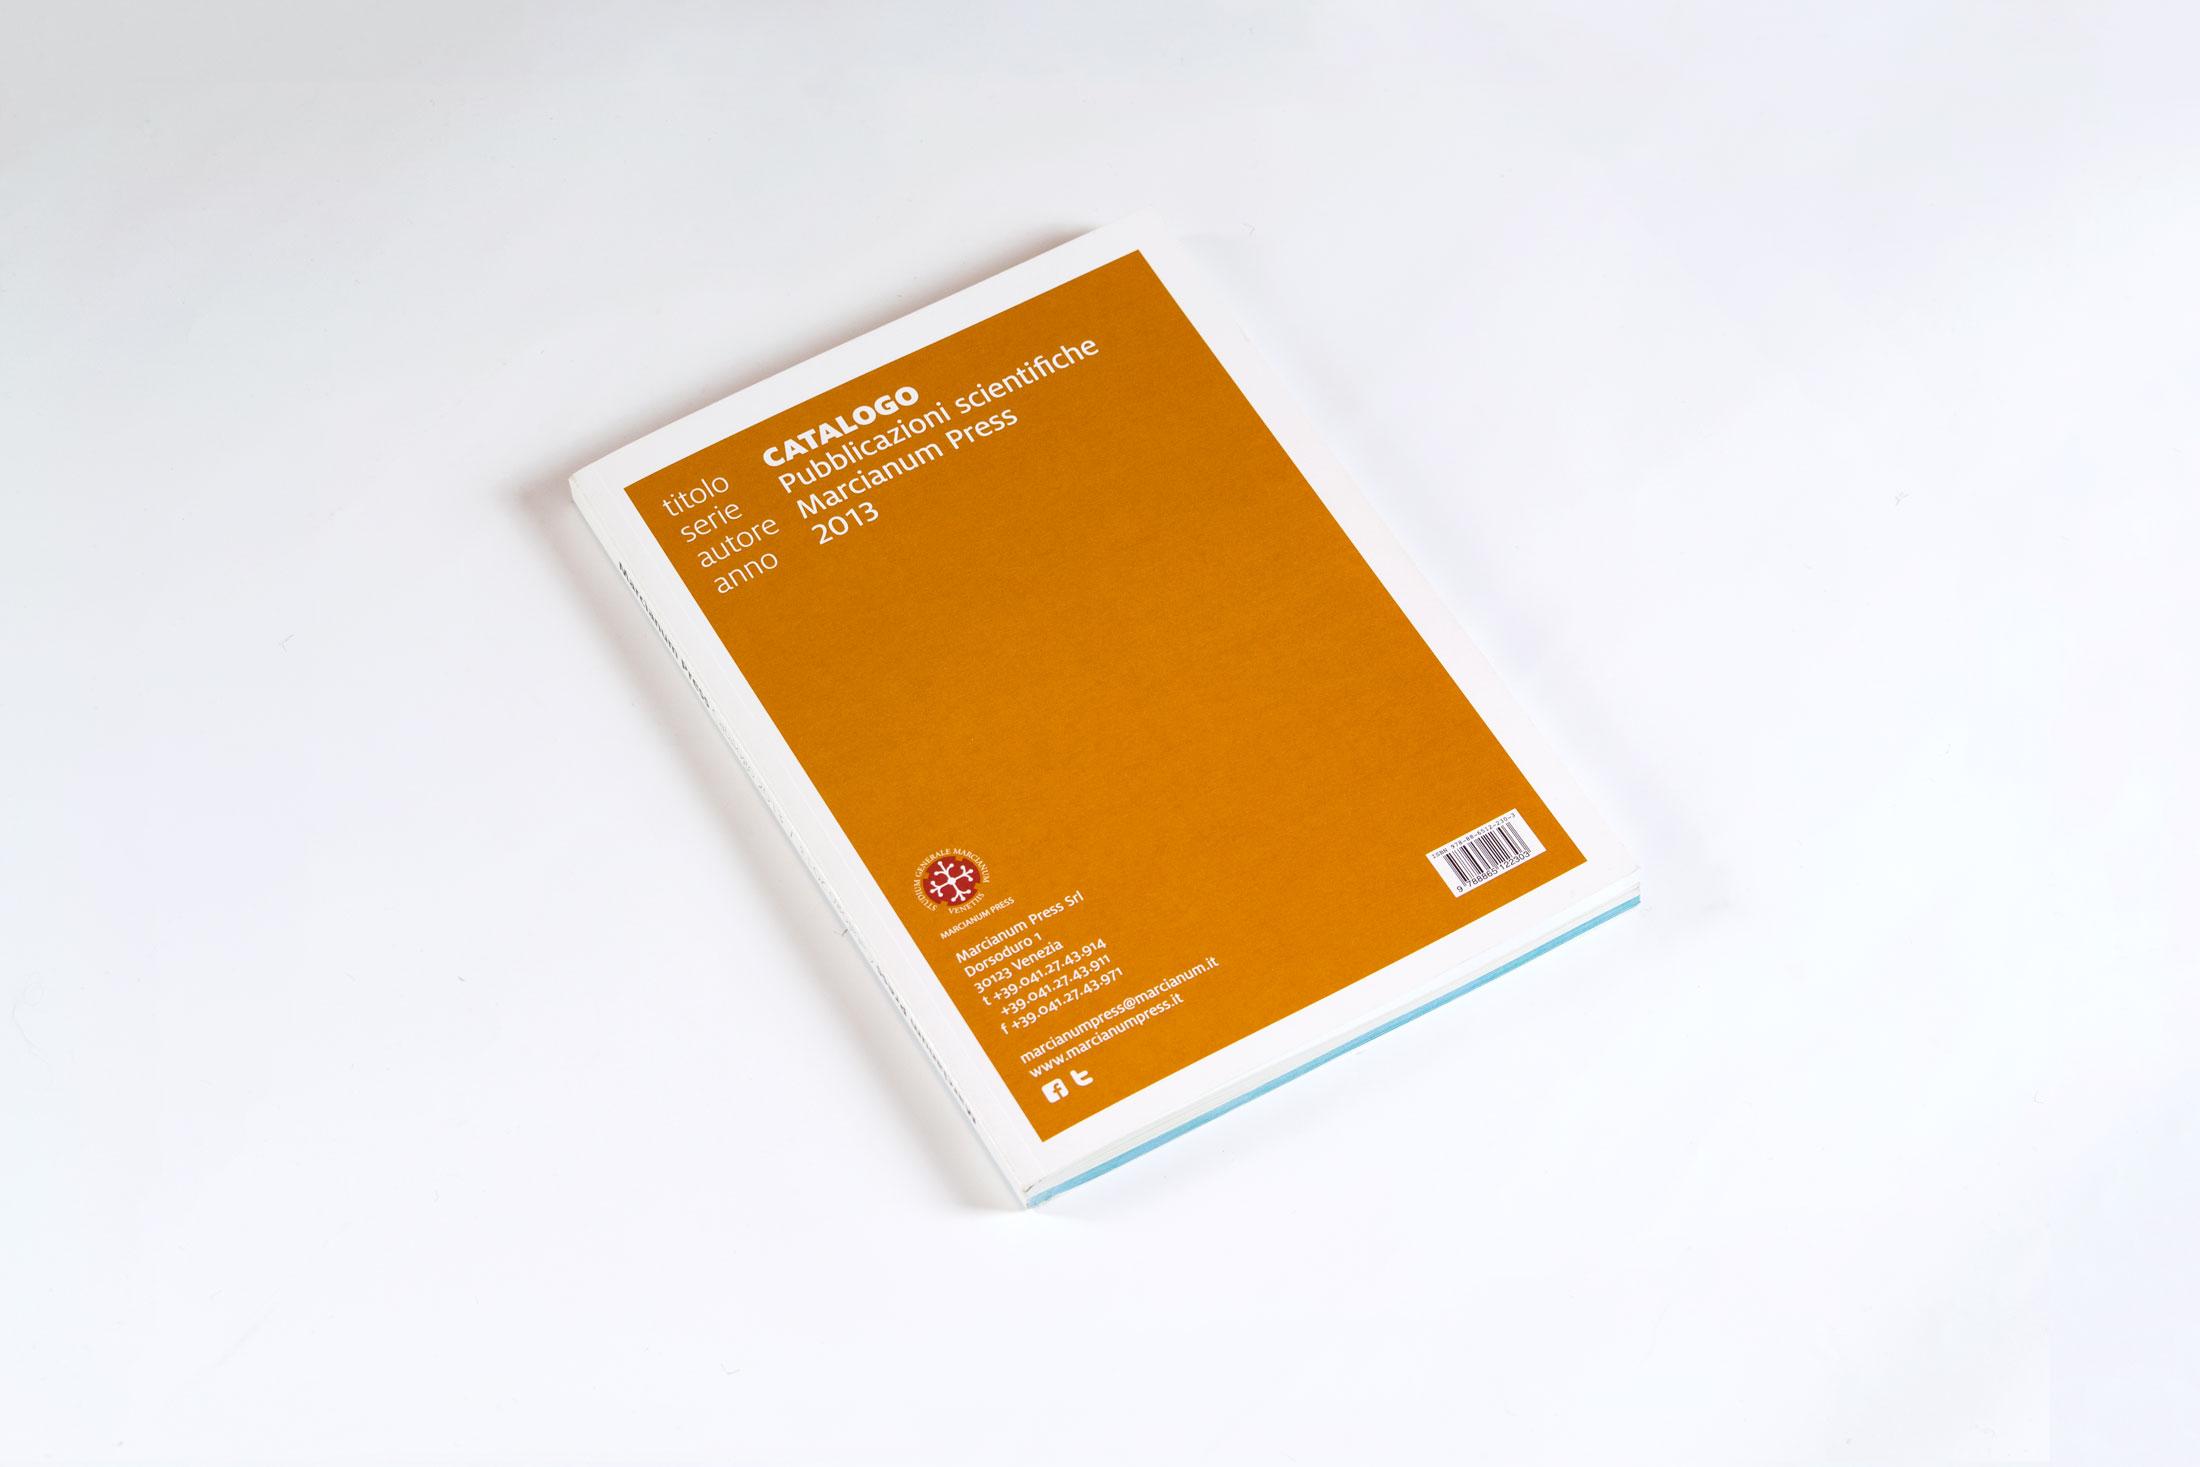 Catalogo Marcianum Press - copertina